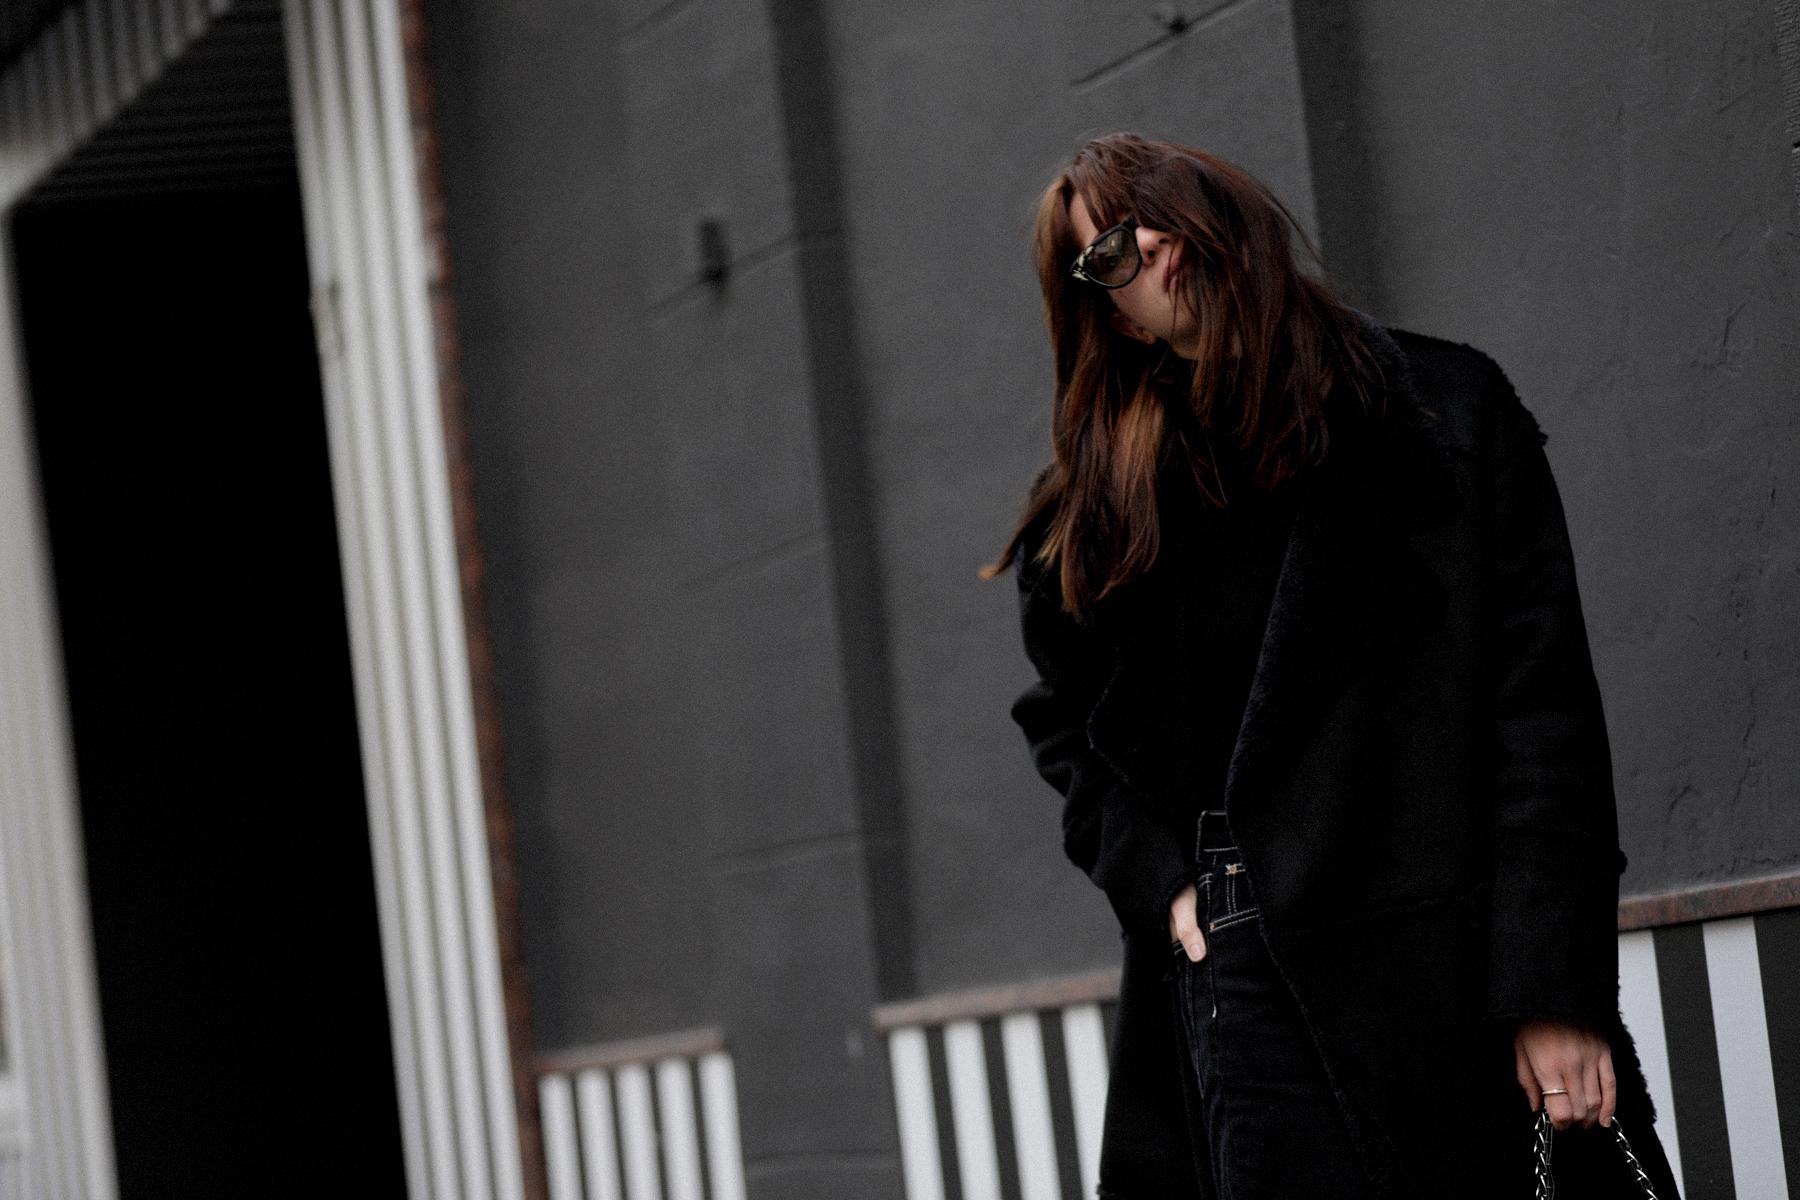 outfit black coat mango zara allblack allblackeverything winterlook fall winter fashion fashionblogger düsseldorf germany cats & dogs modeblog styleblog 3